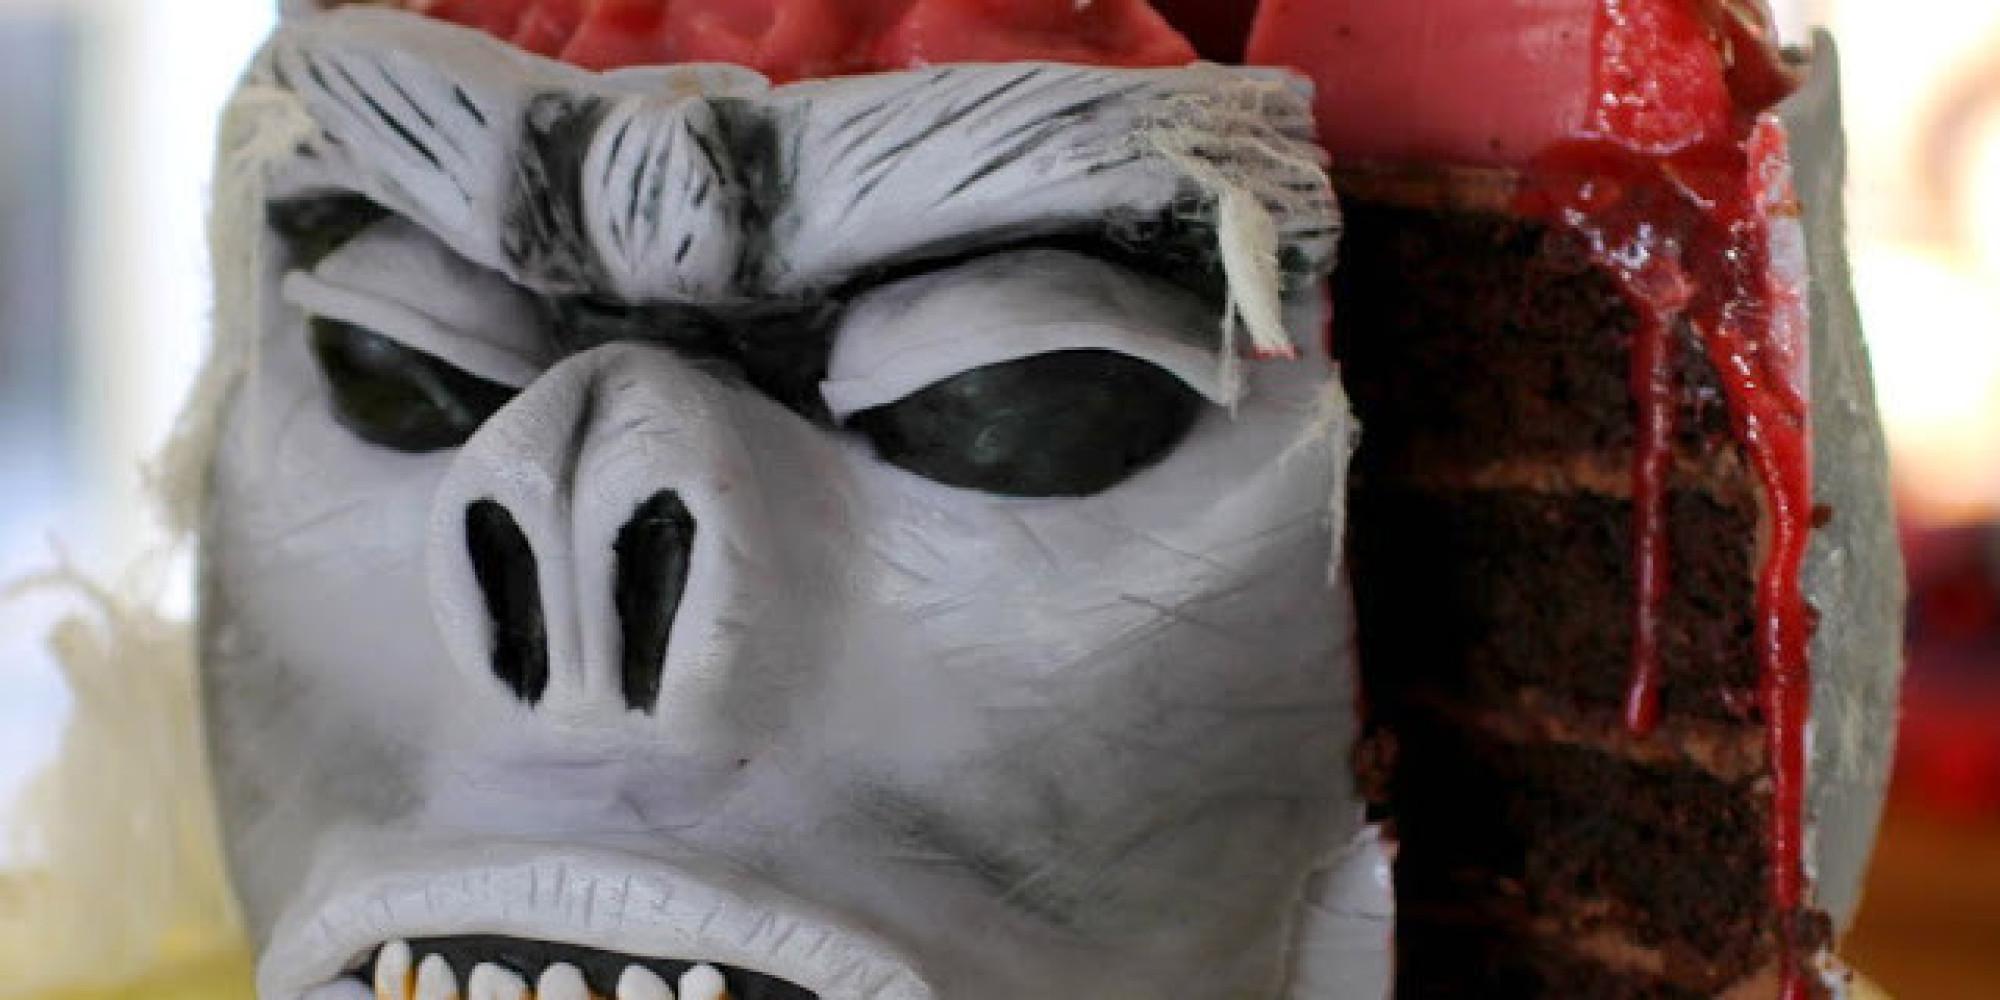 Creepy Halloween Cake Shopping List: Brains, Bugs, Blood And ...